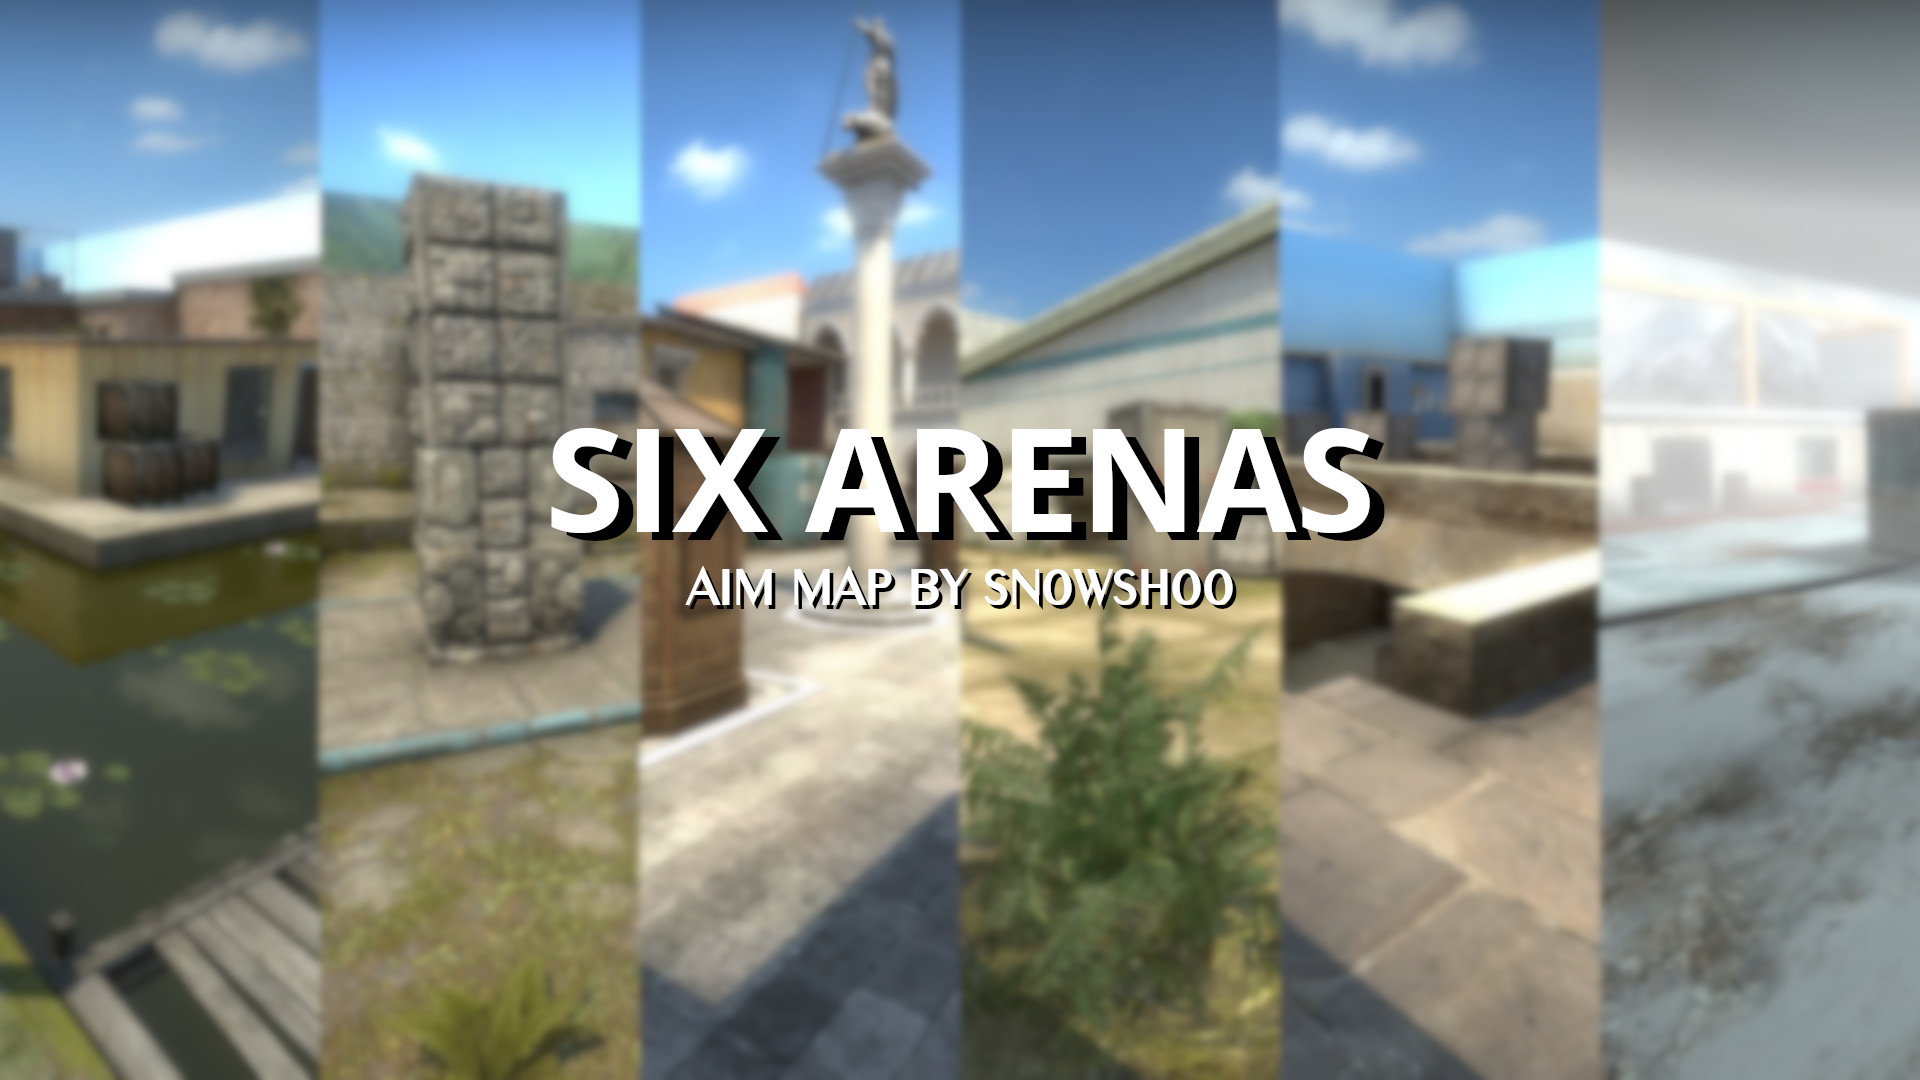 aim_six_arenas.jpg.f8657b08b01c4a75f69ee15b6675cbdf.jpg